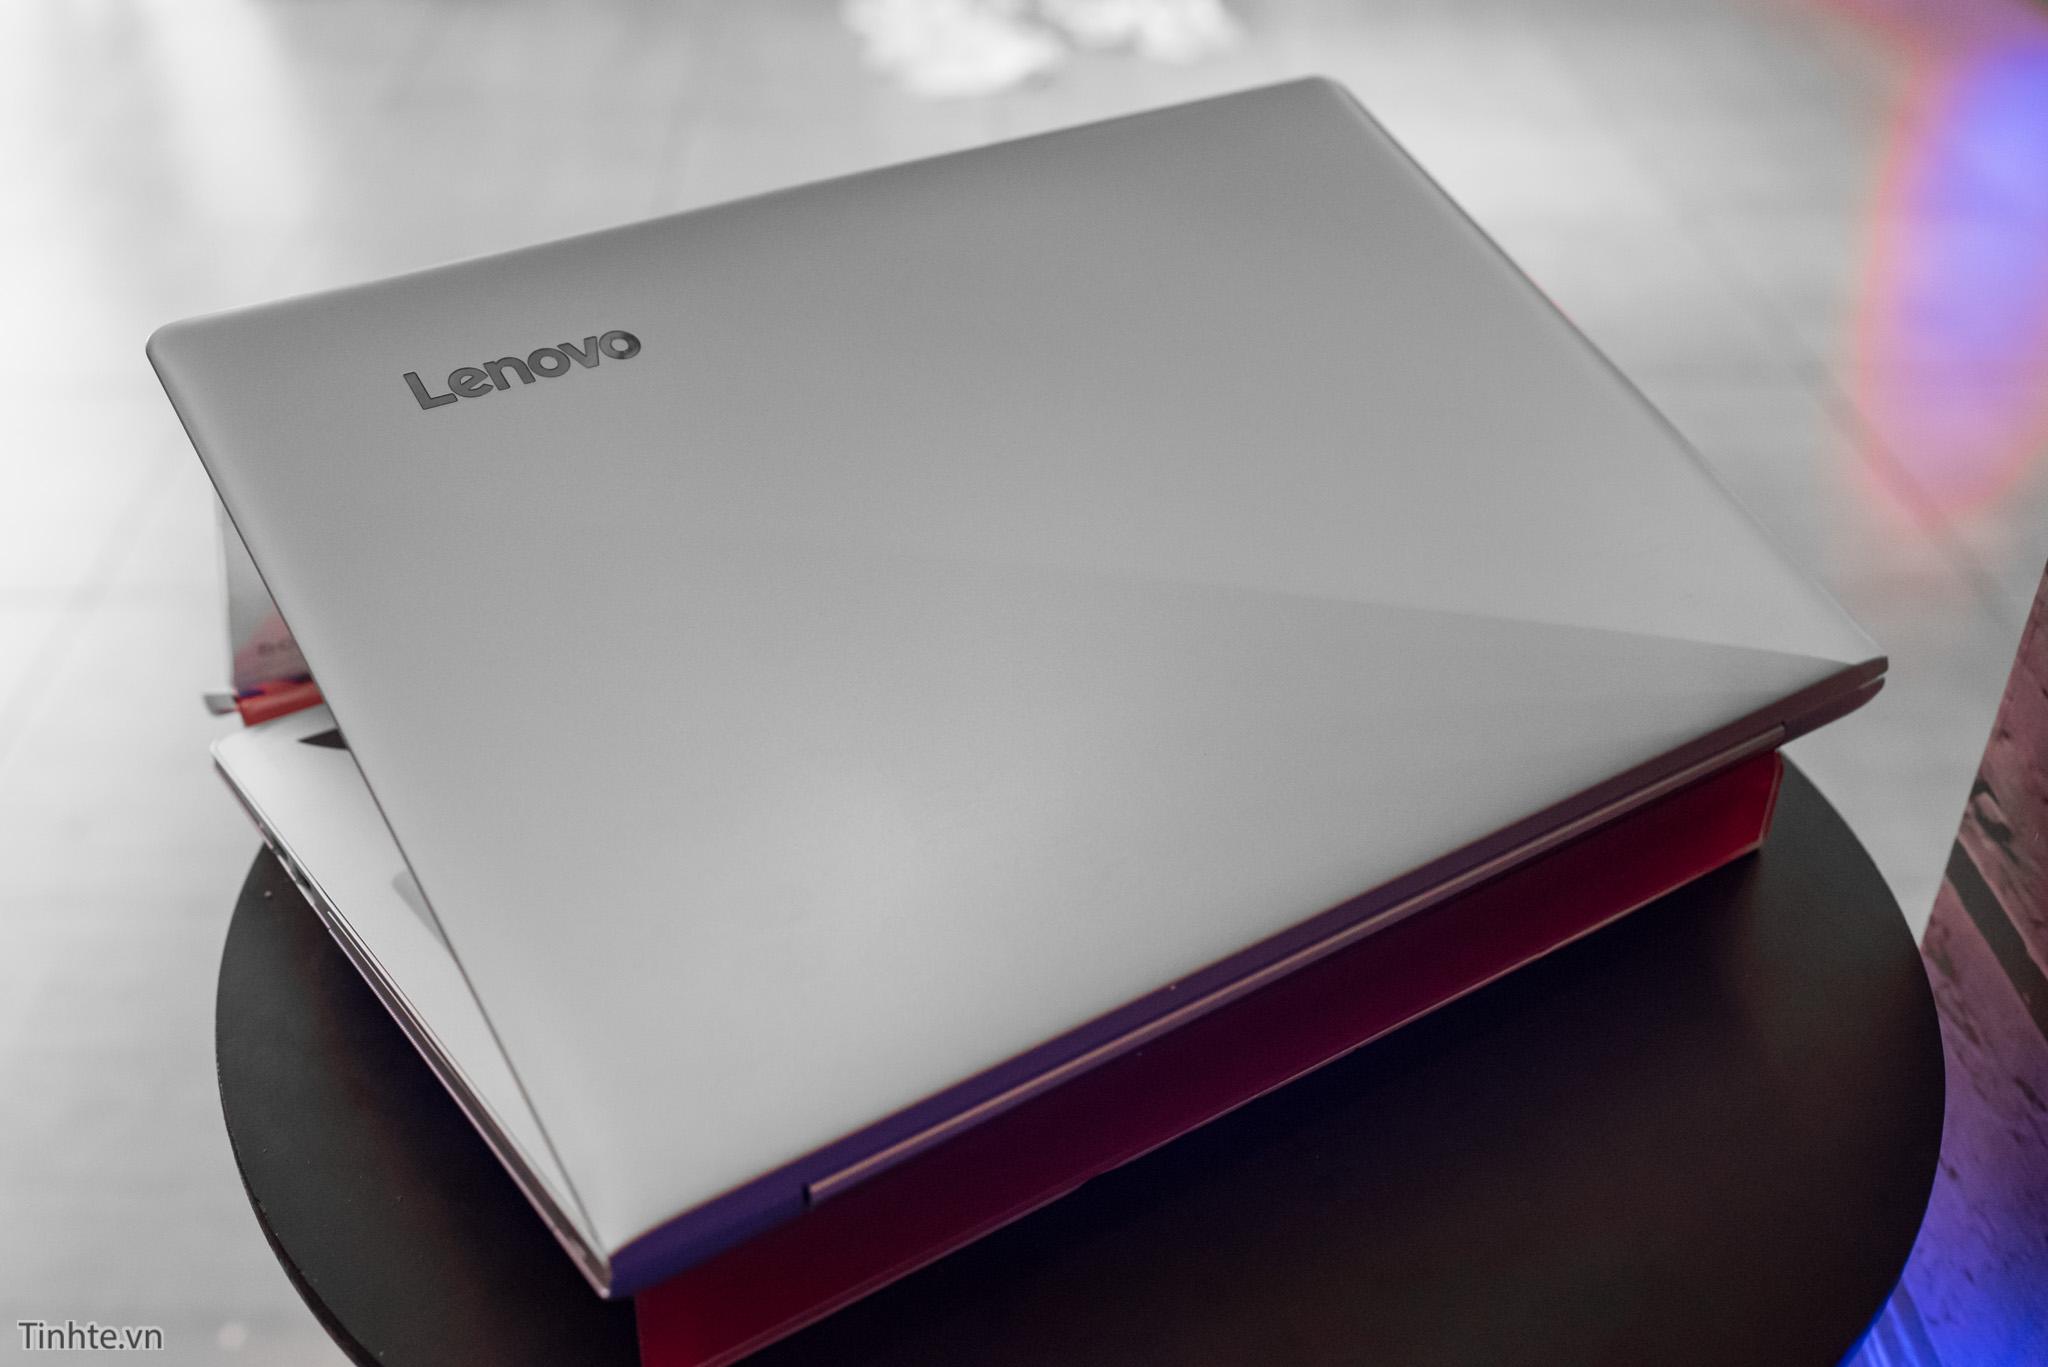 Tinhte.vn_Lenovo_IdeaPad_500-6.jpg